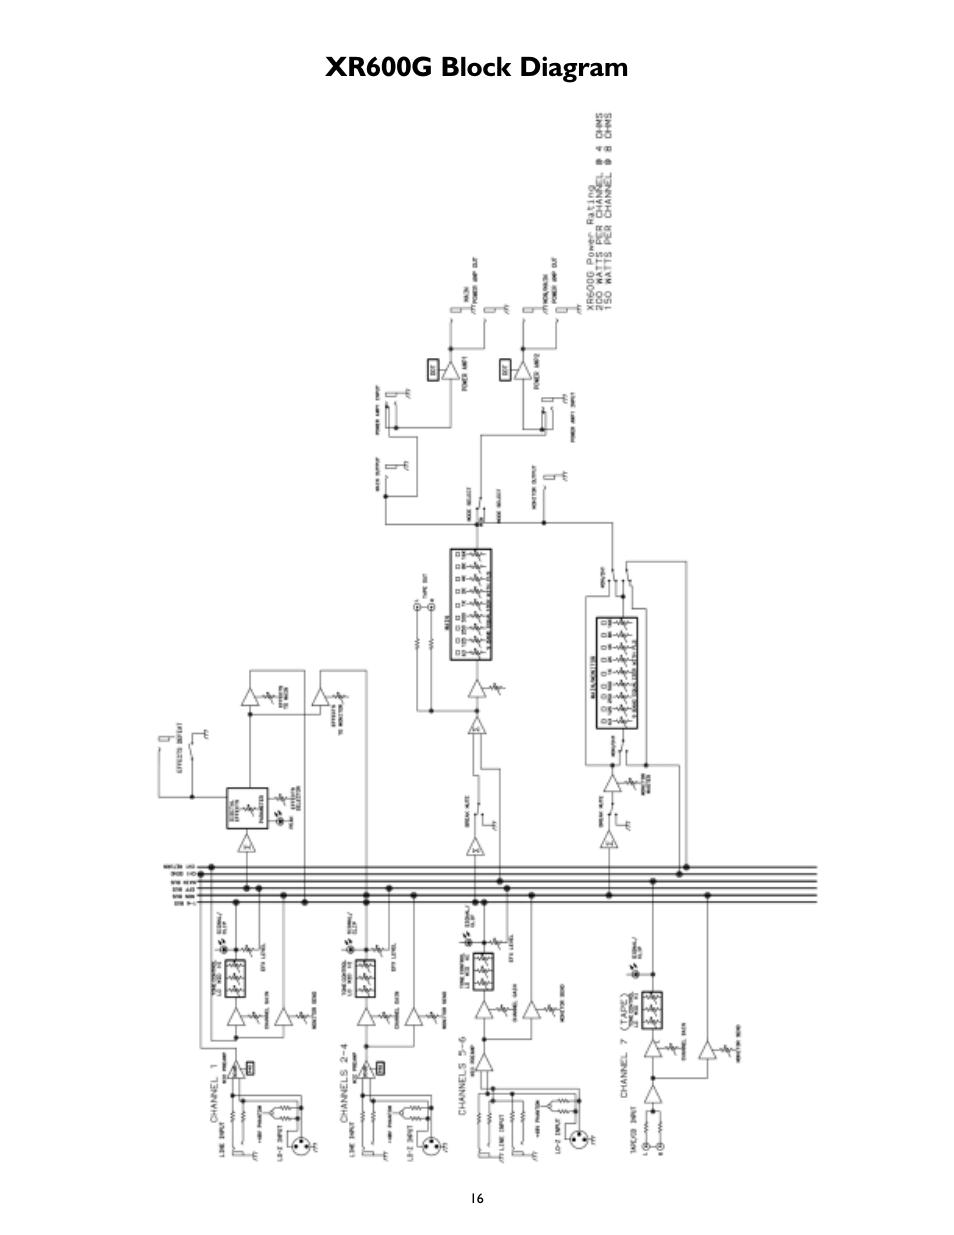 garmin g1000 block diagram